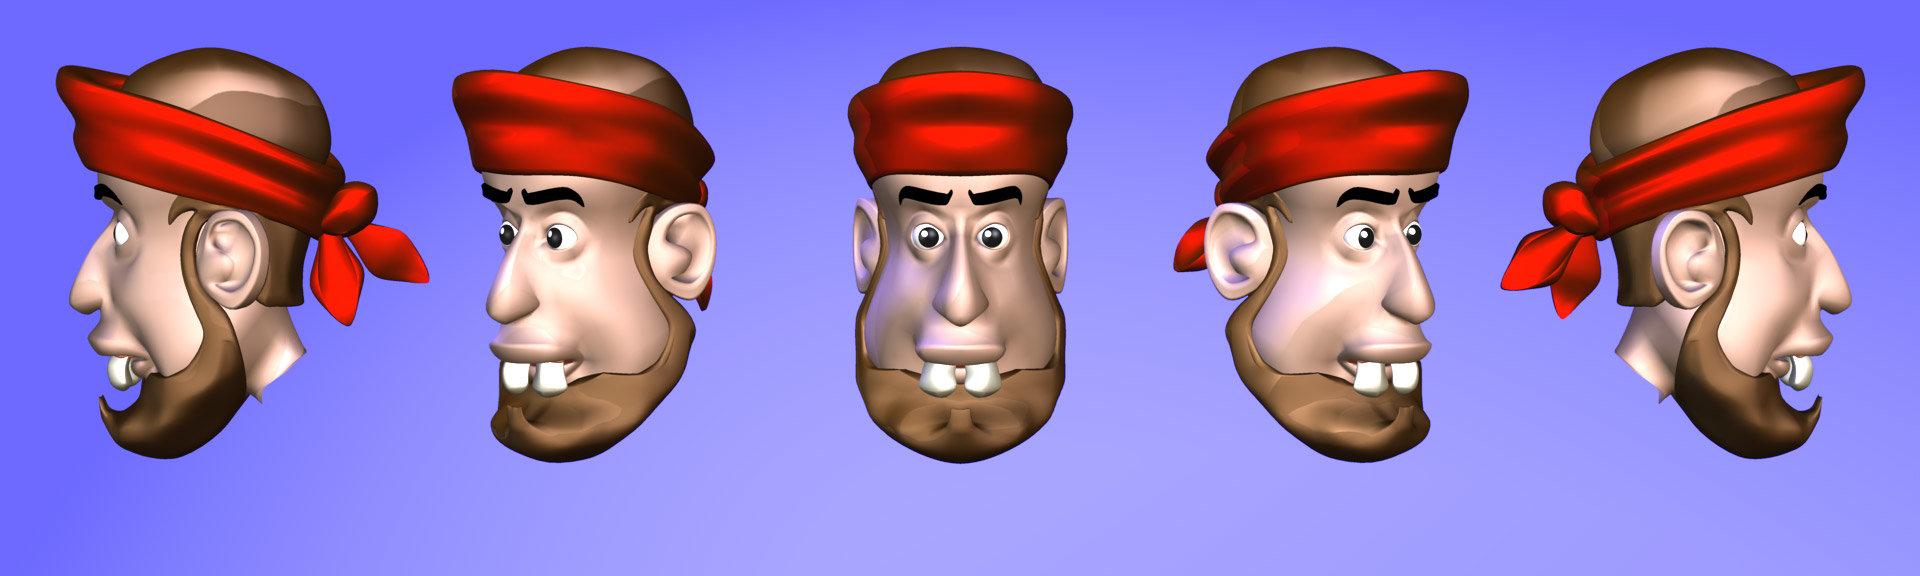 4poco_heads0.jpg